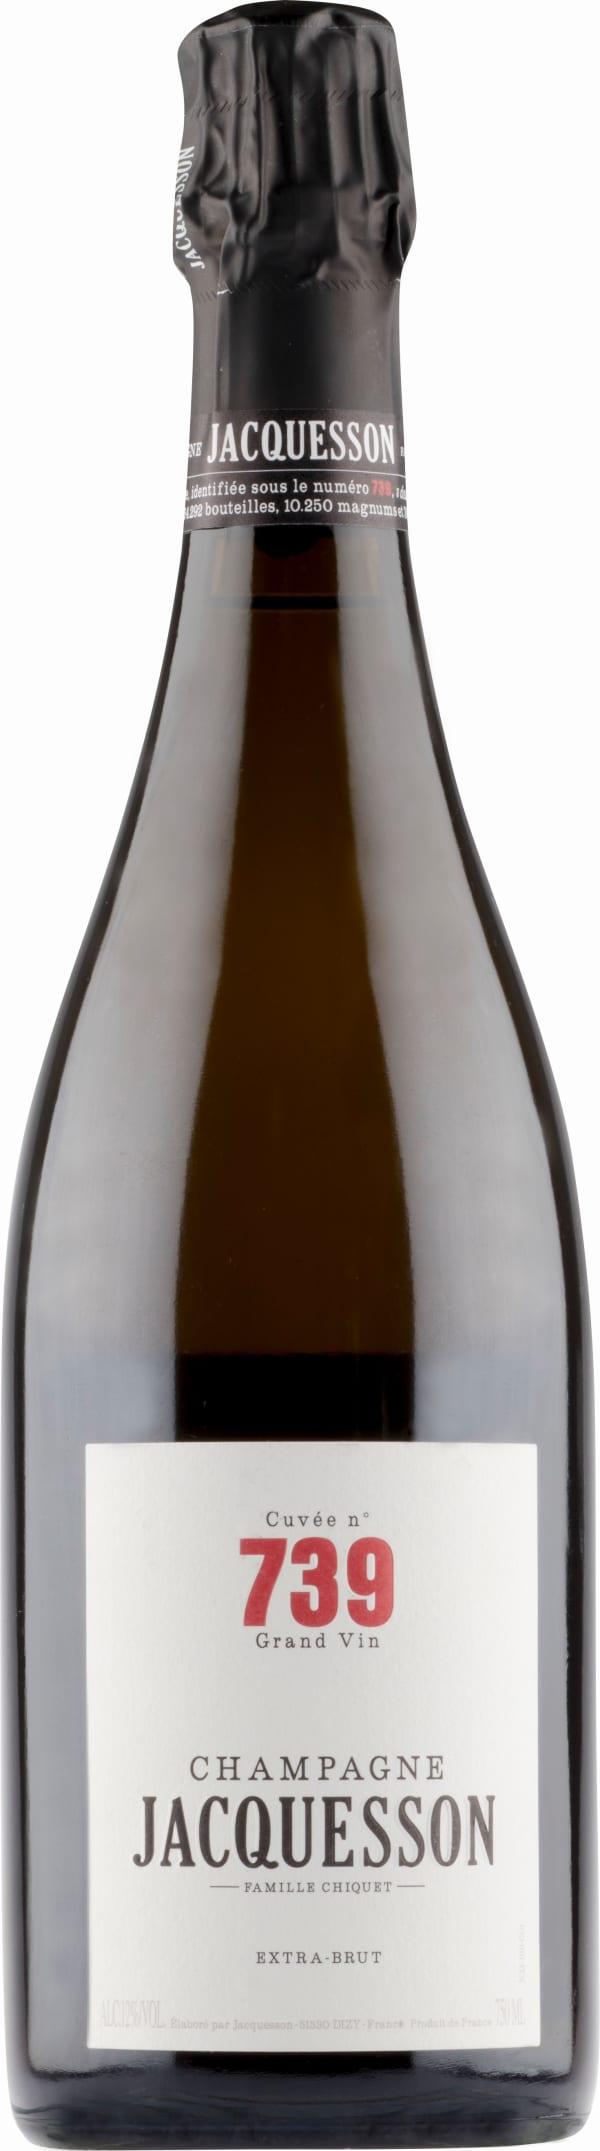 Jacquesson Cuvée 740 Champagne Extra-Brut